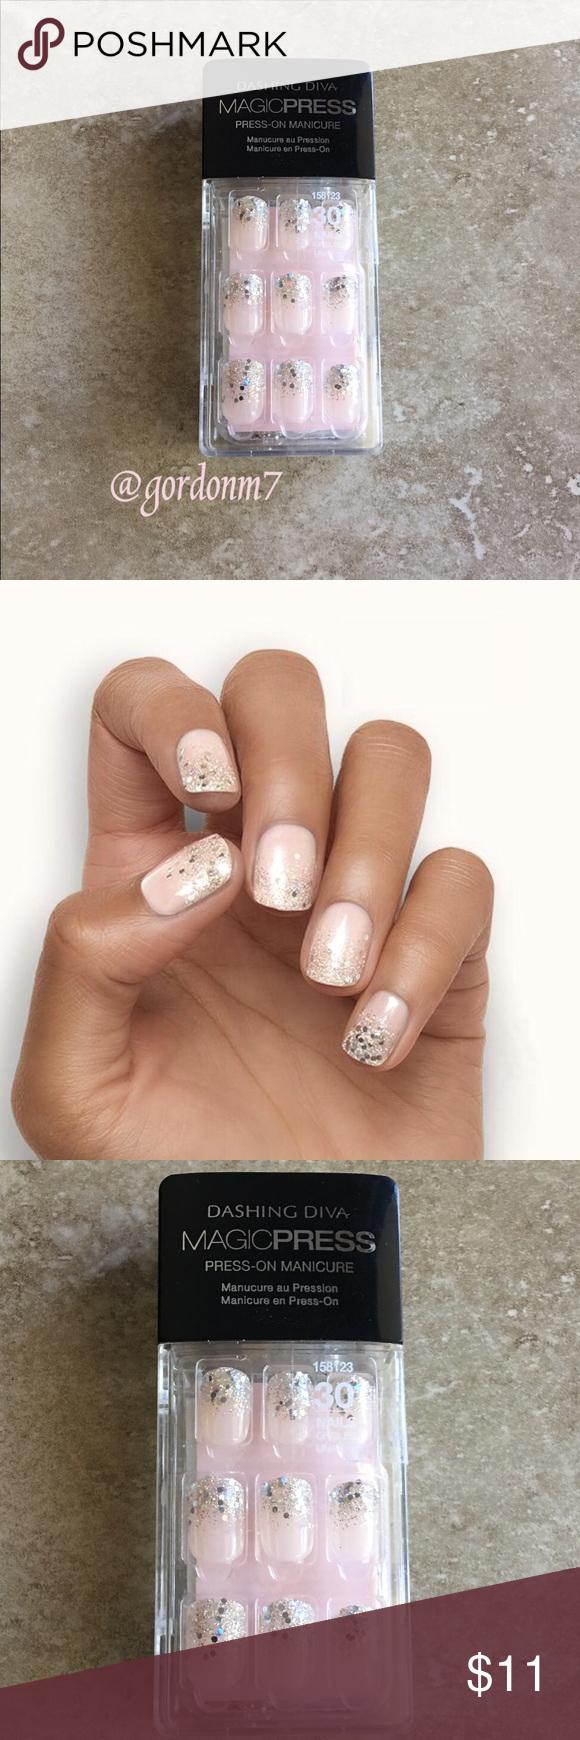 New Dashing Diva Glam Squad Press On Nails Diva Nails Nails Press On Nails